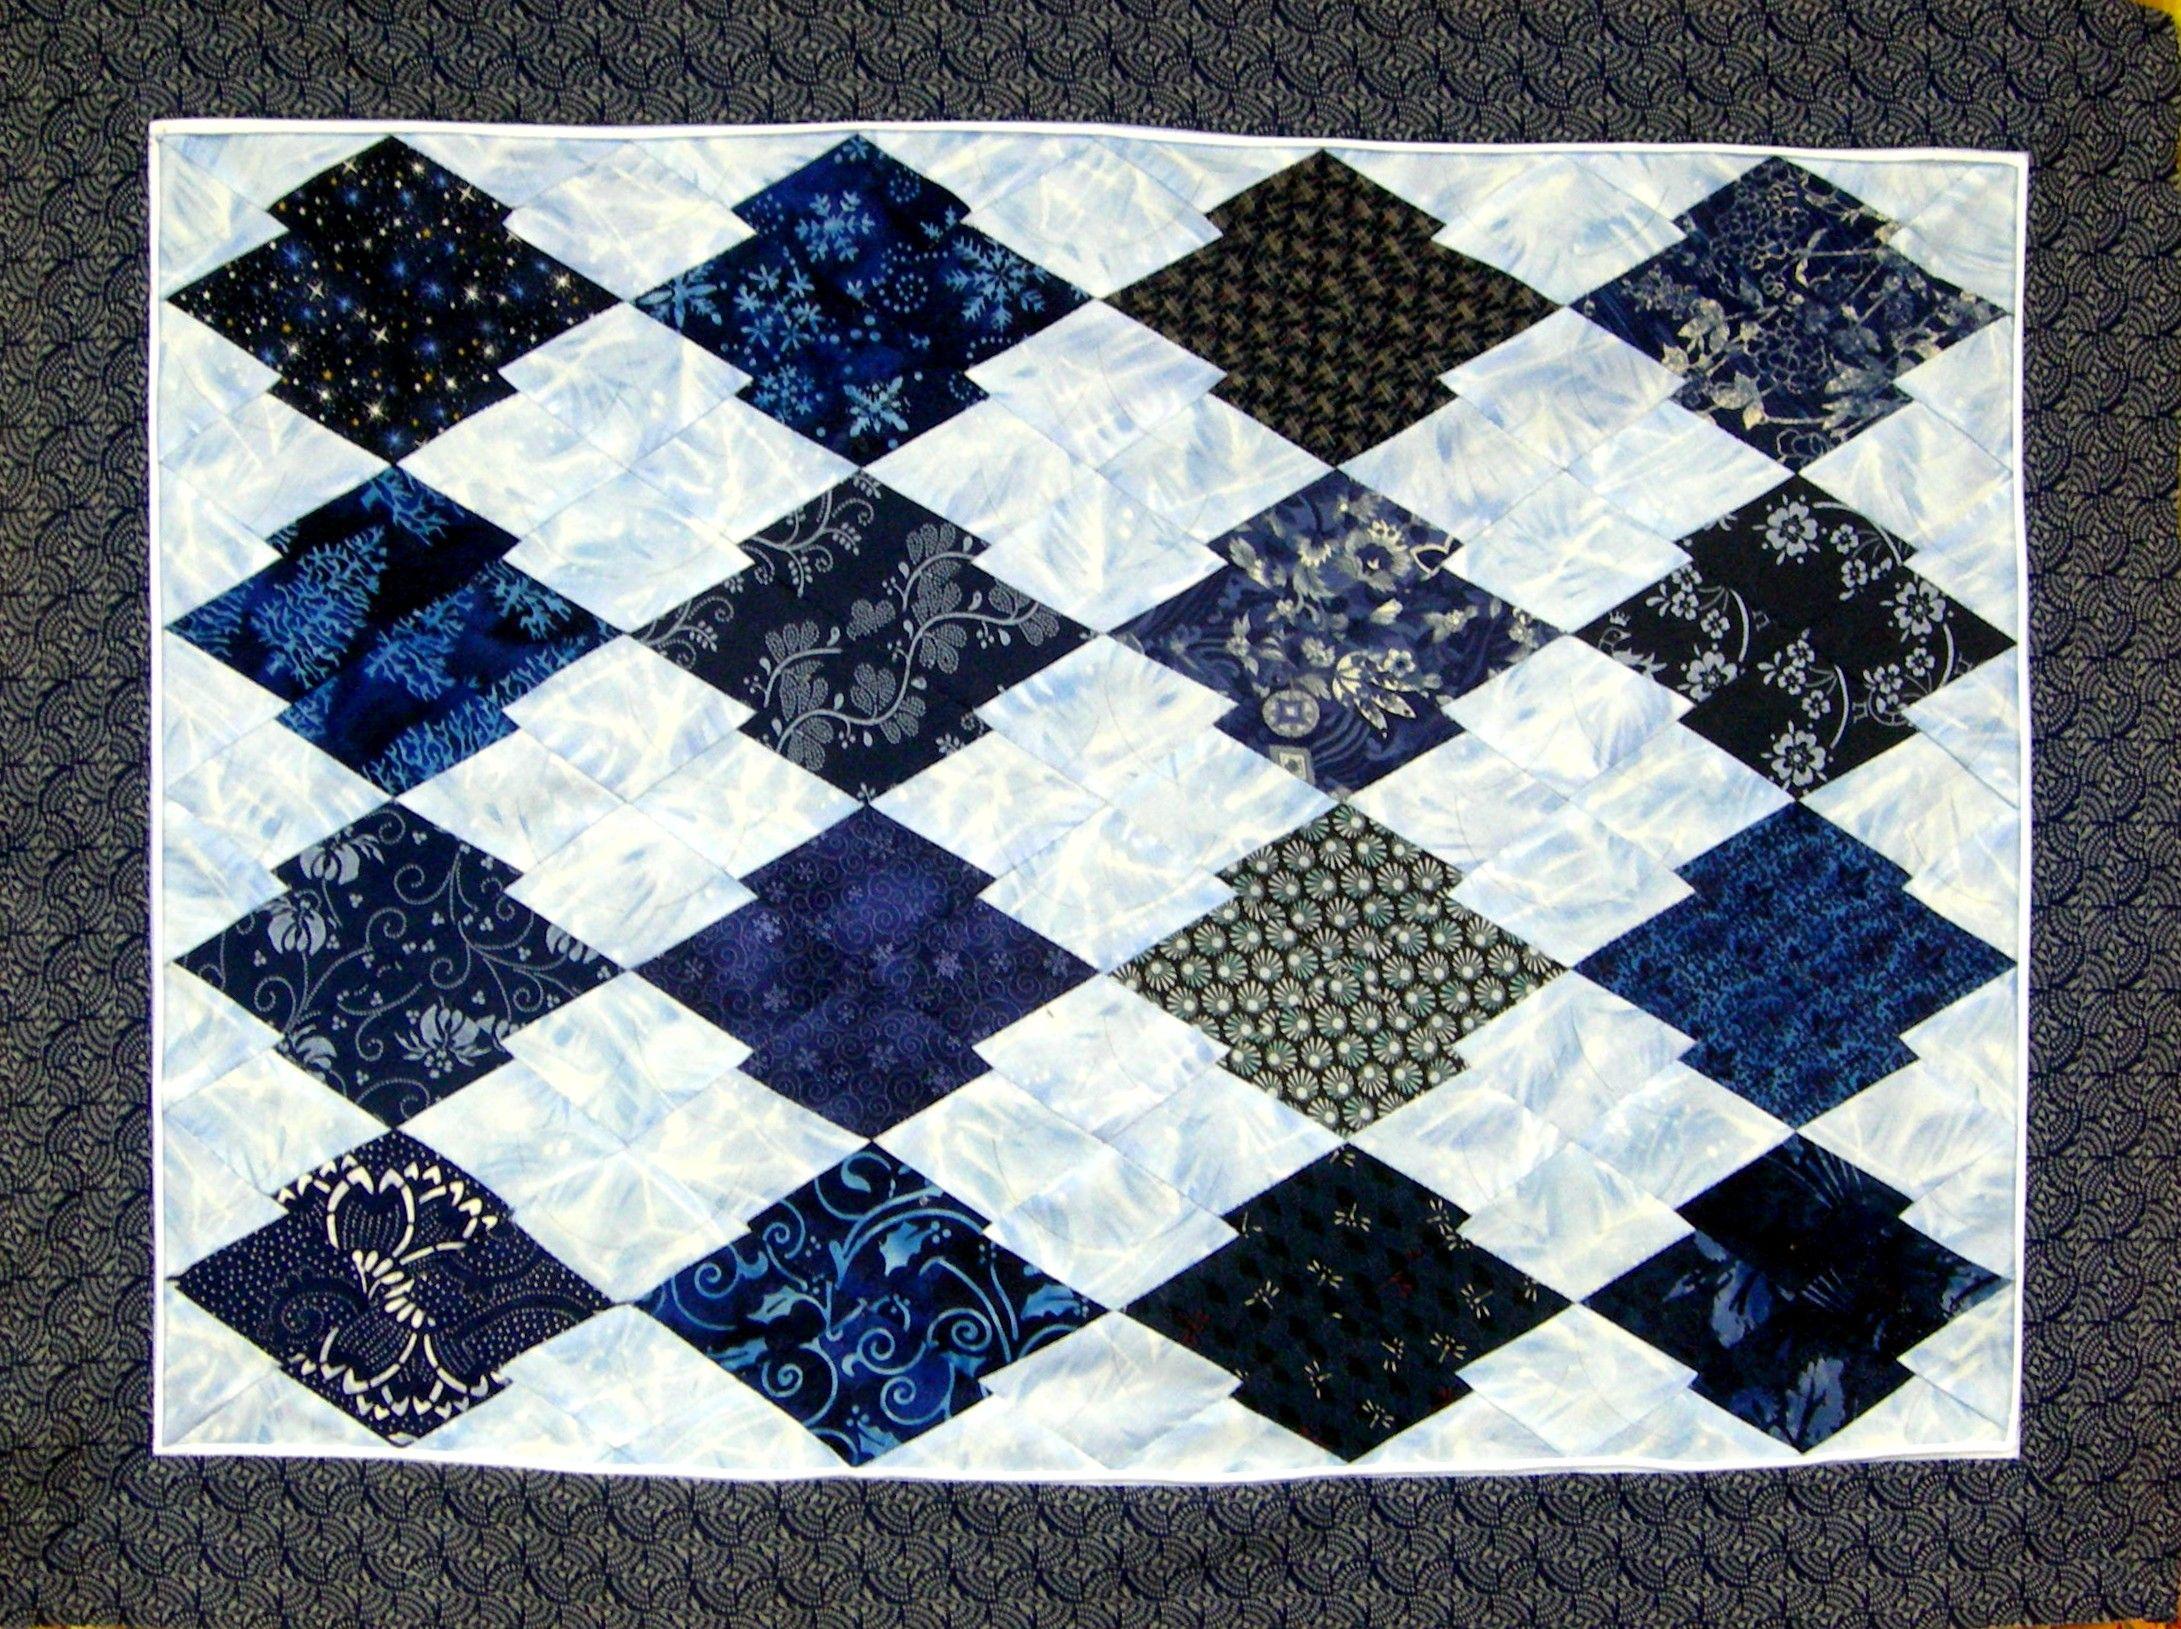 Japanese Puzzle Quilt